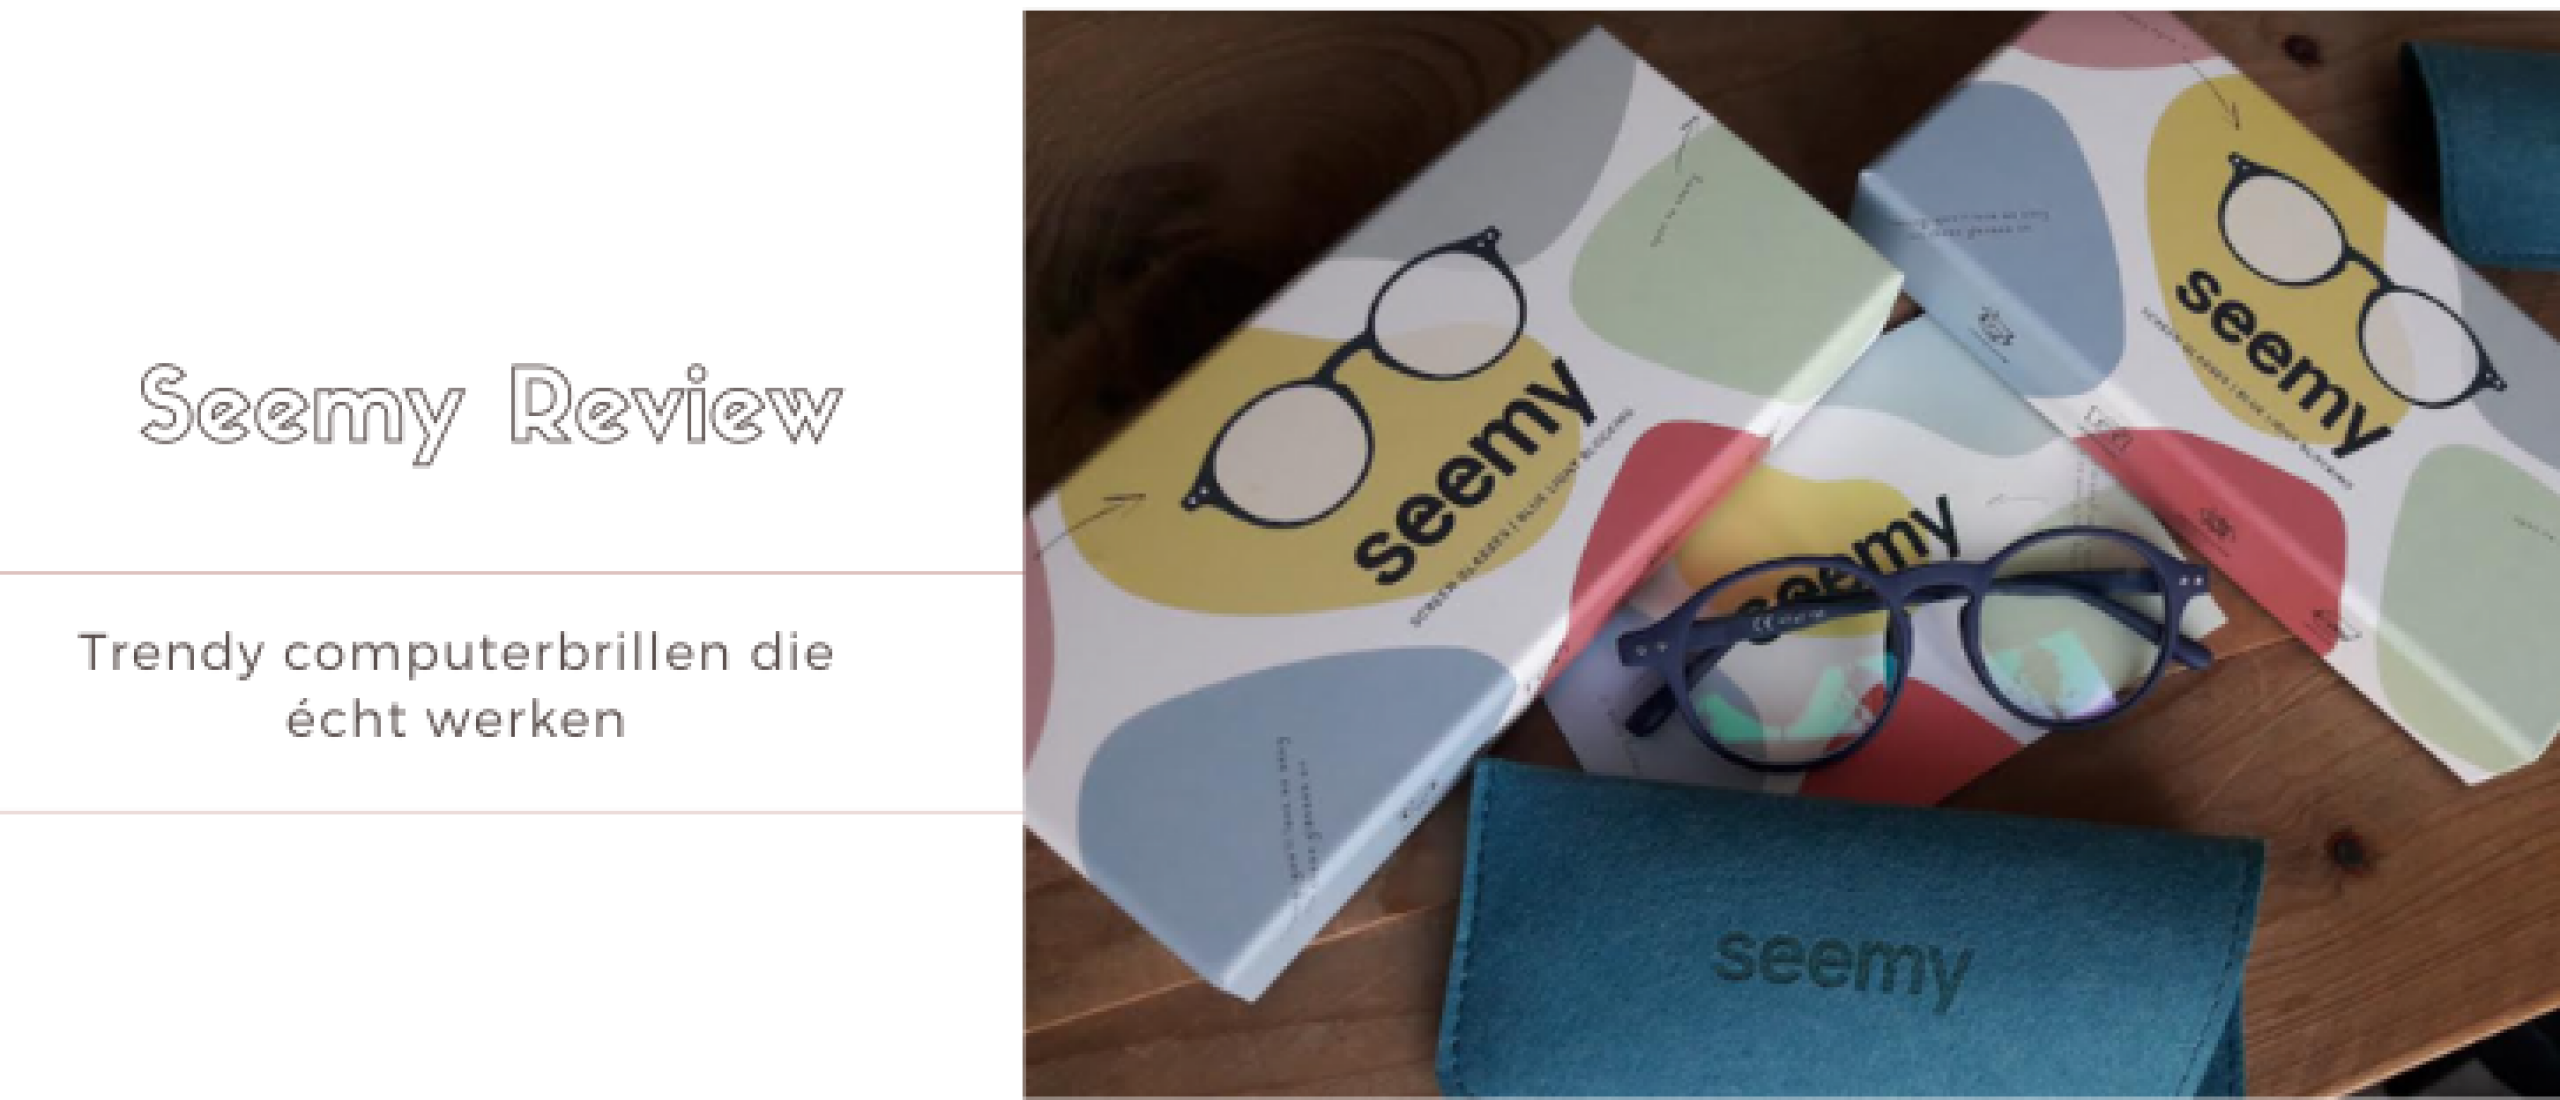 Seemy Review: Mooie Functionele Computerbrillen